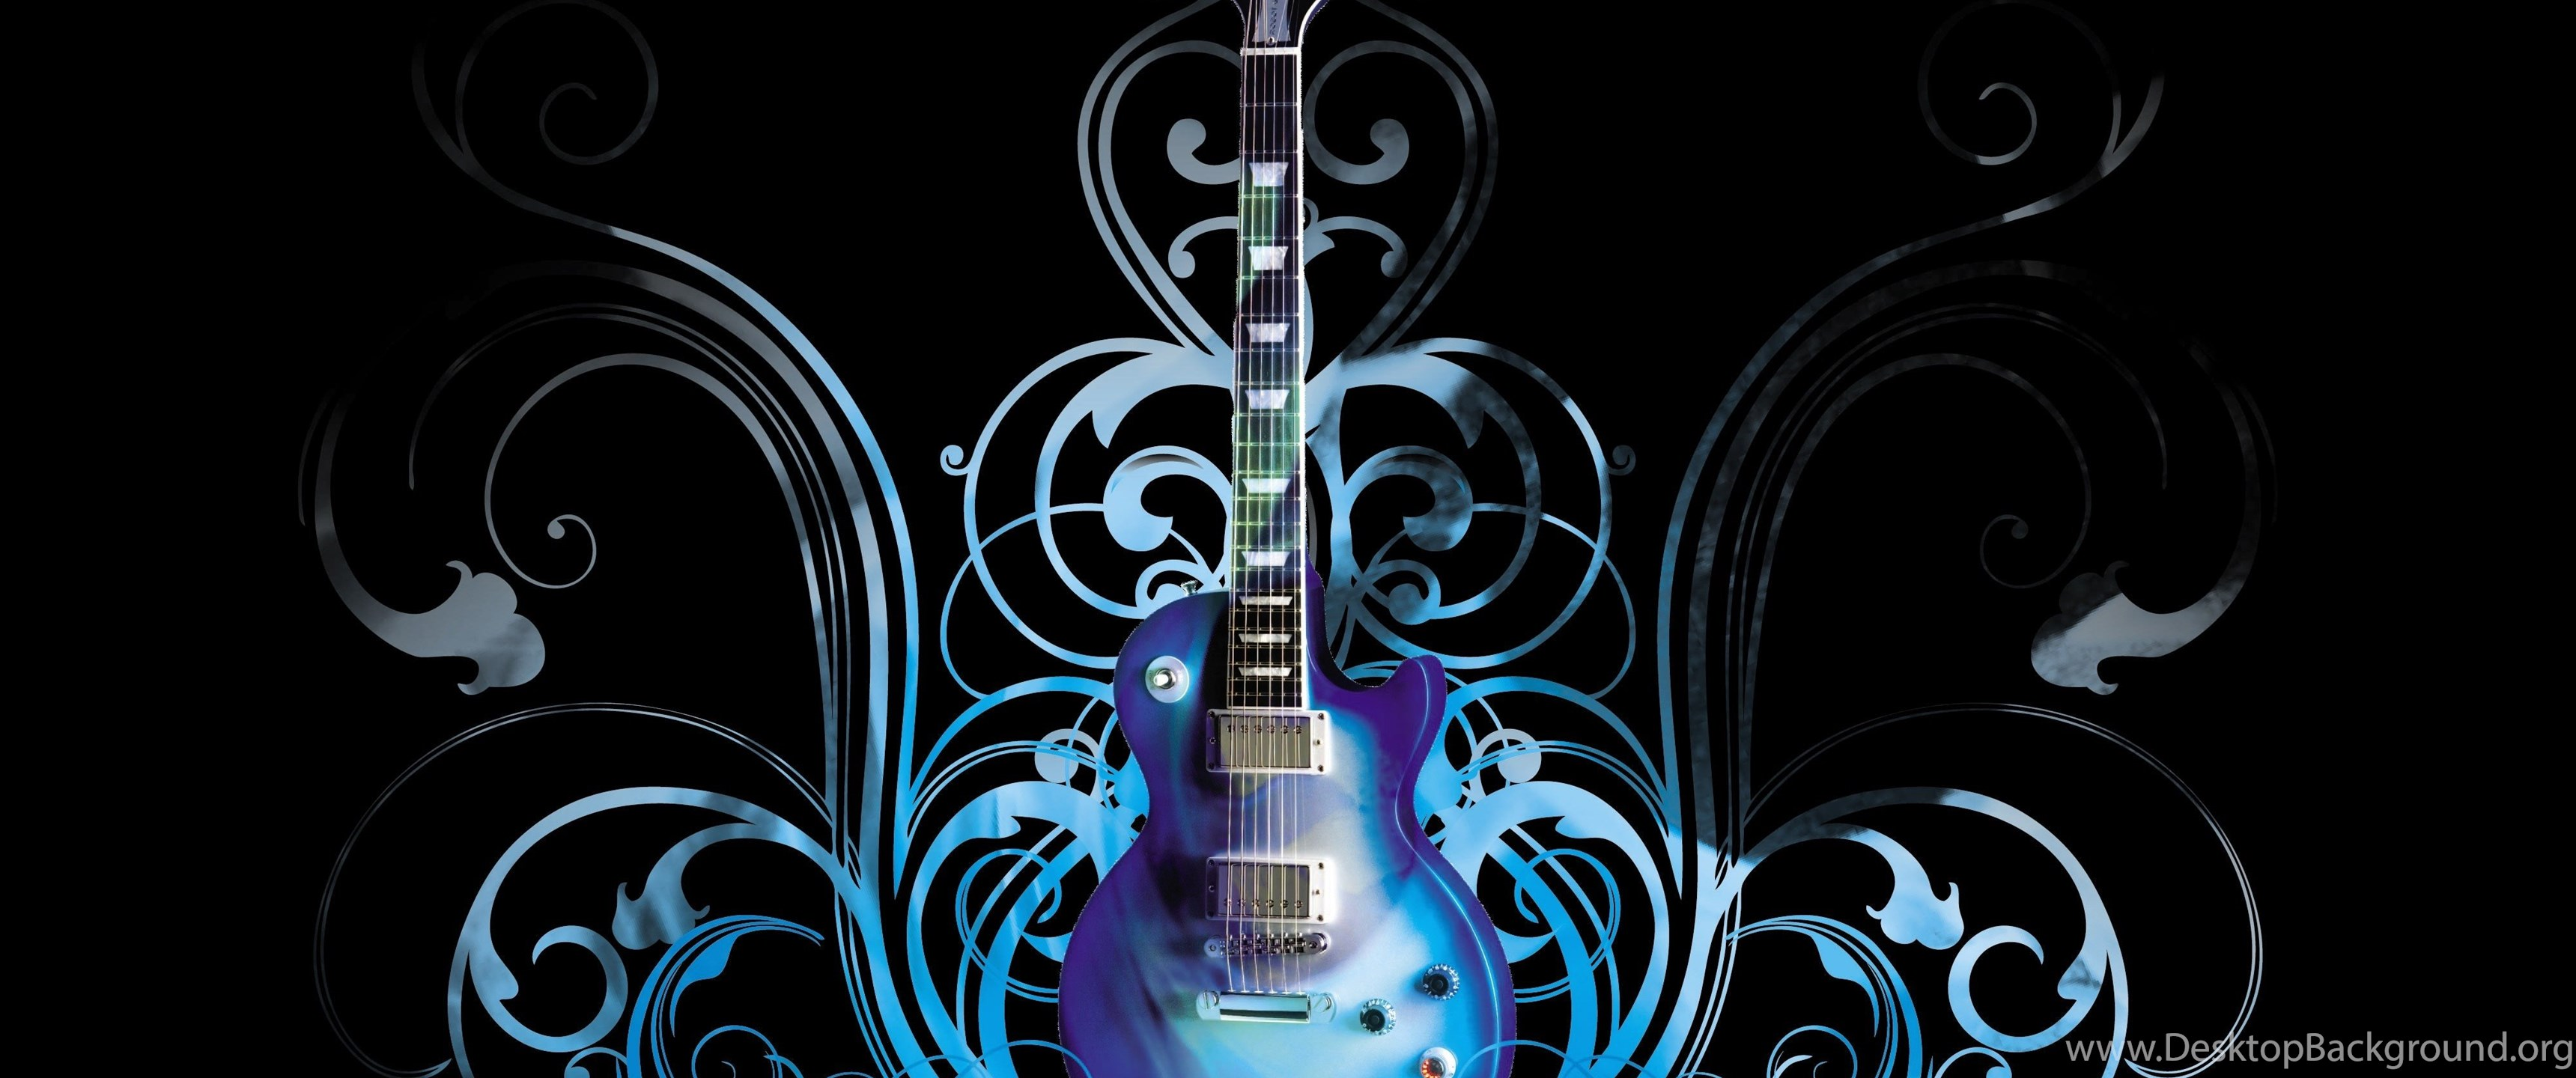 Guitar Wallpapers High Quality Desktop Background